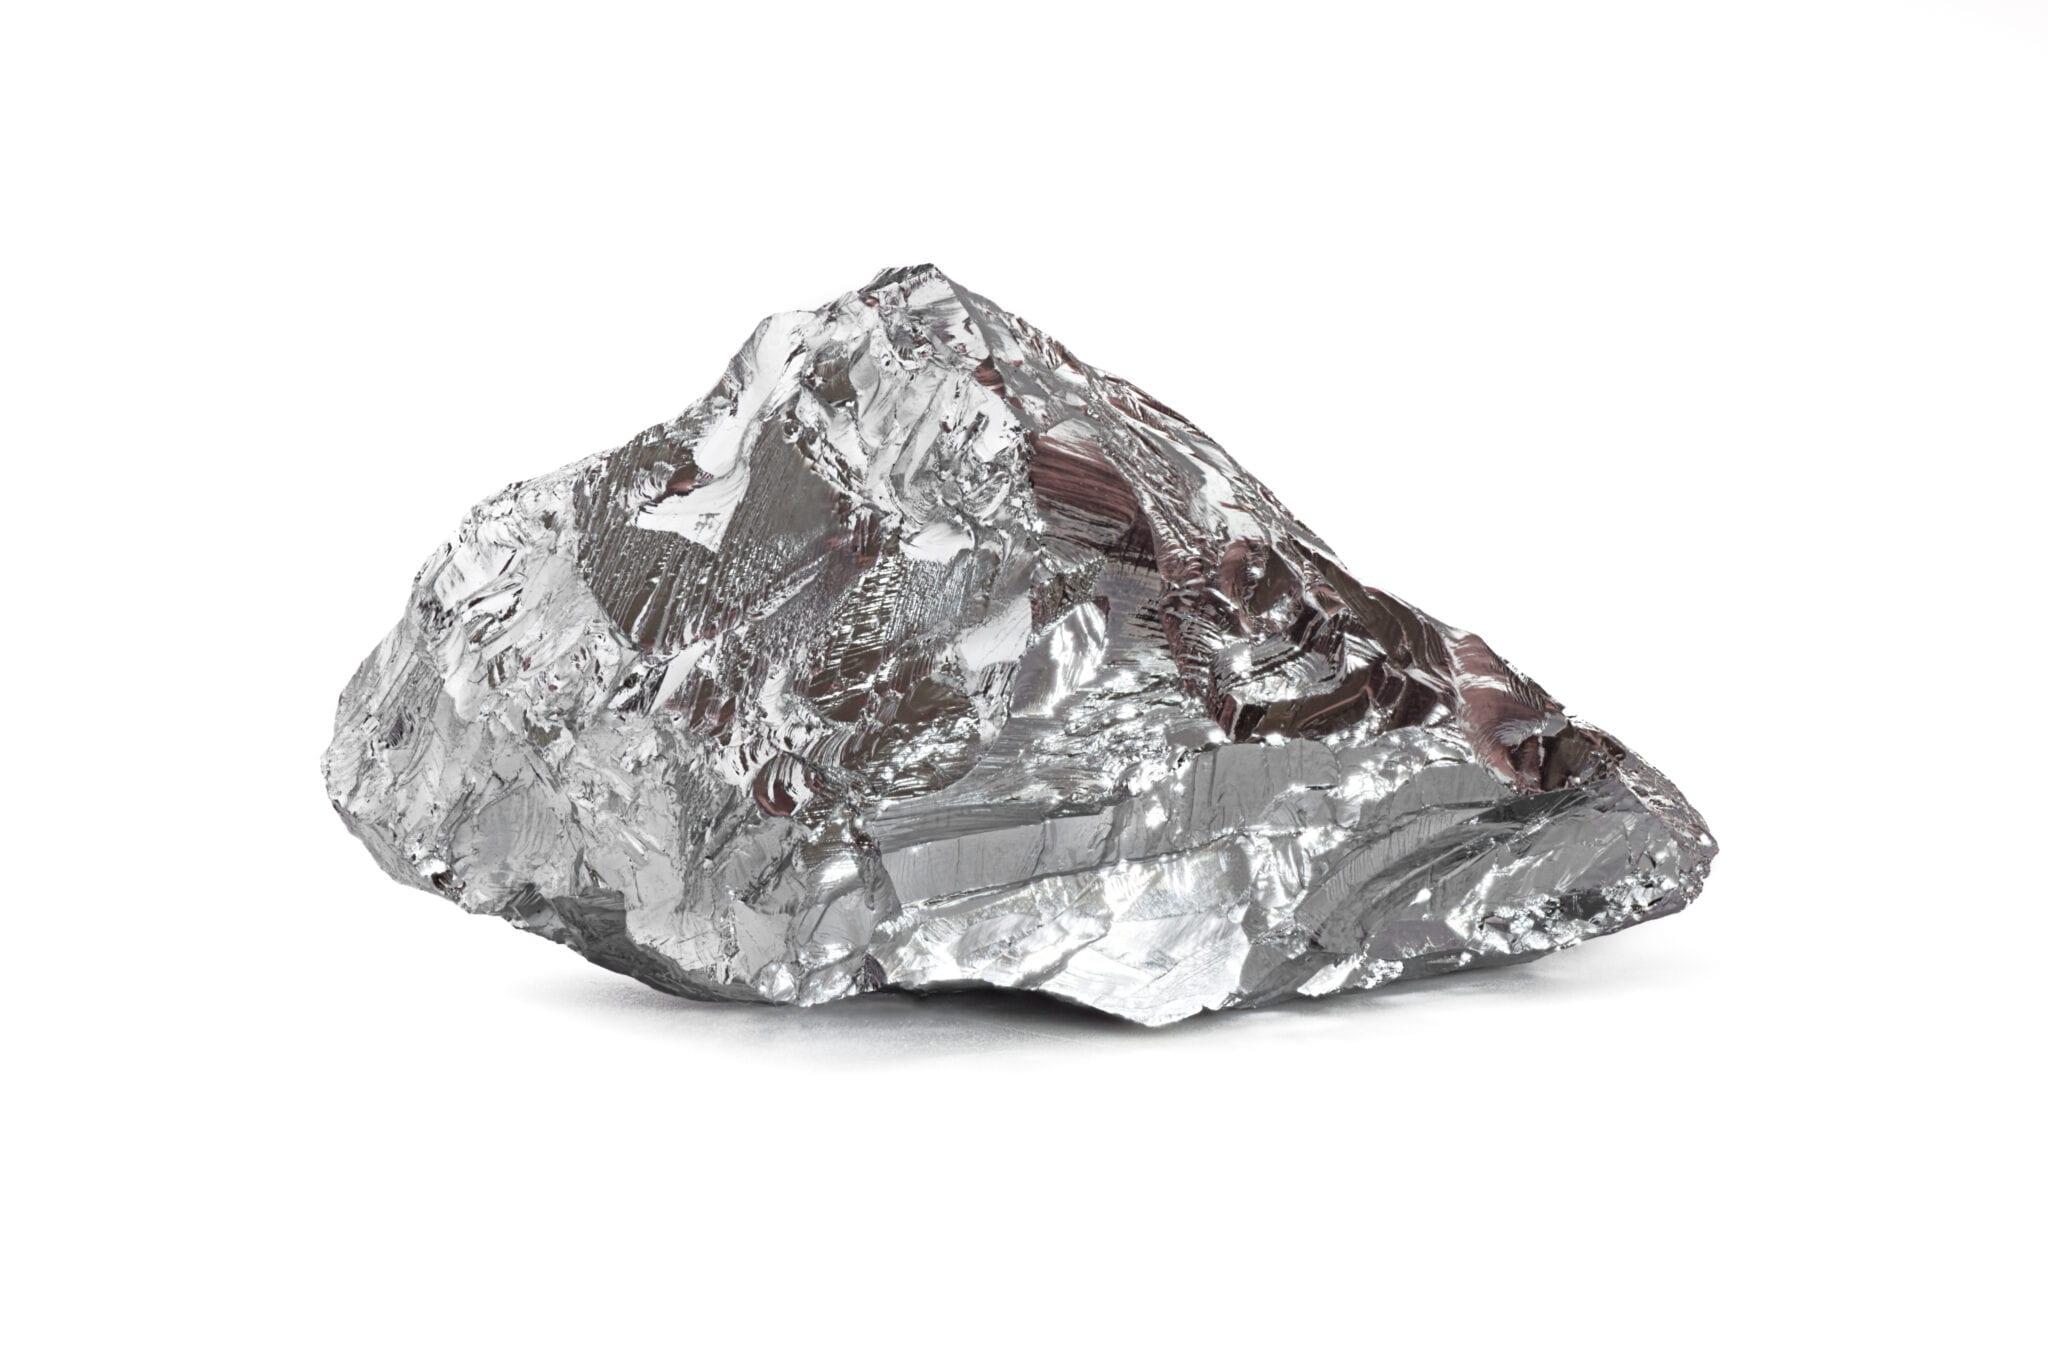 A piece of nickel metal ore, part of nickel mining stocks